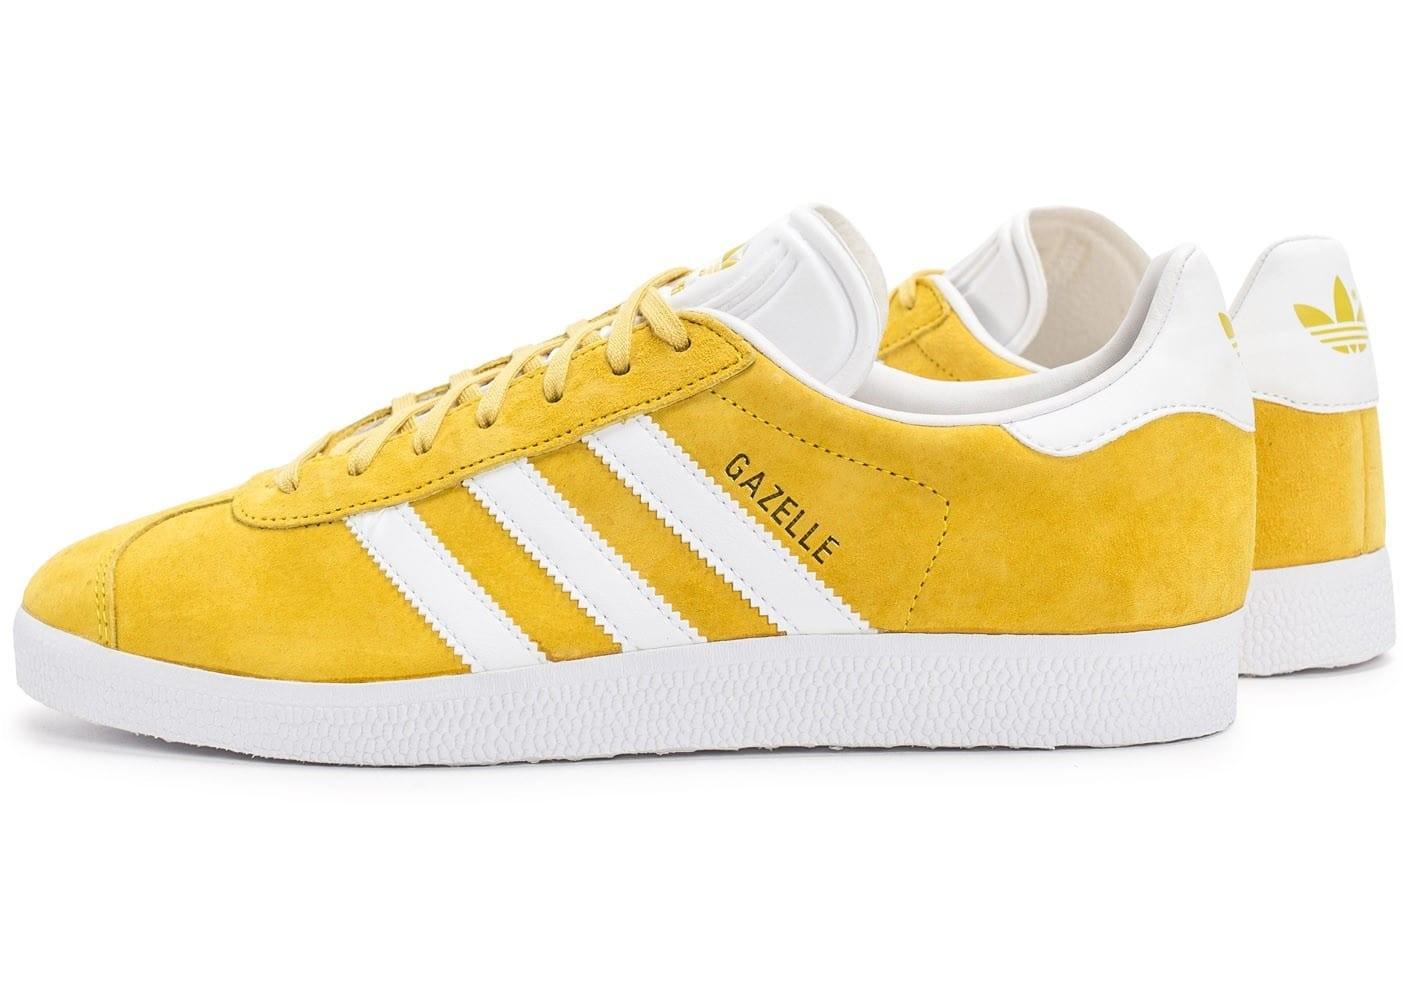 chaussures adidas jaune,Chaussures & vêtements Adidas pas cher